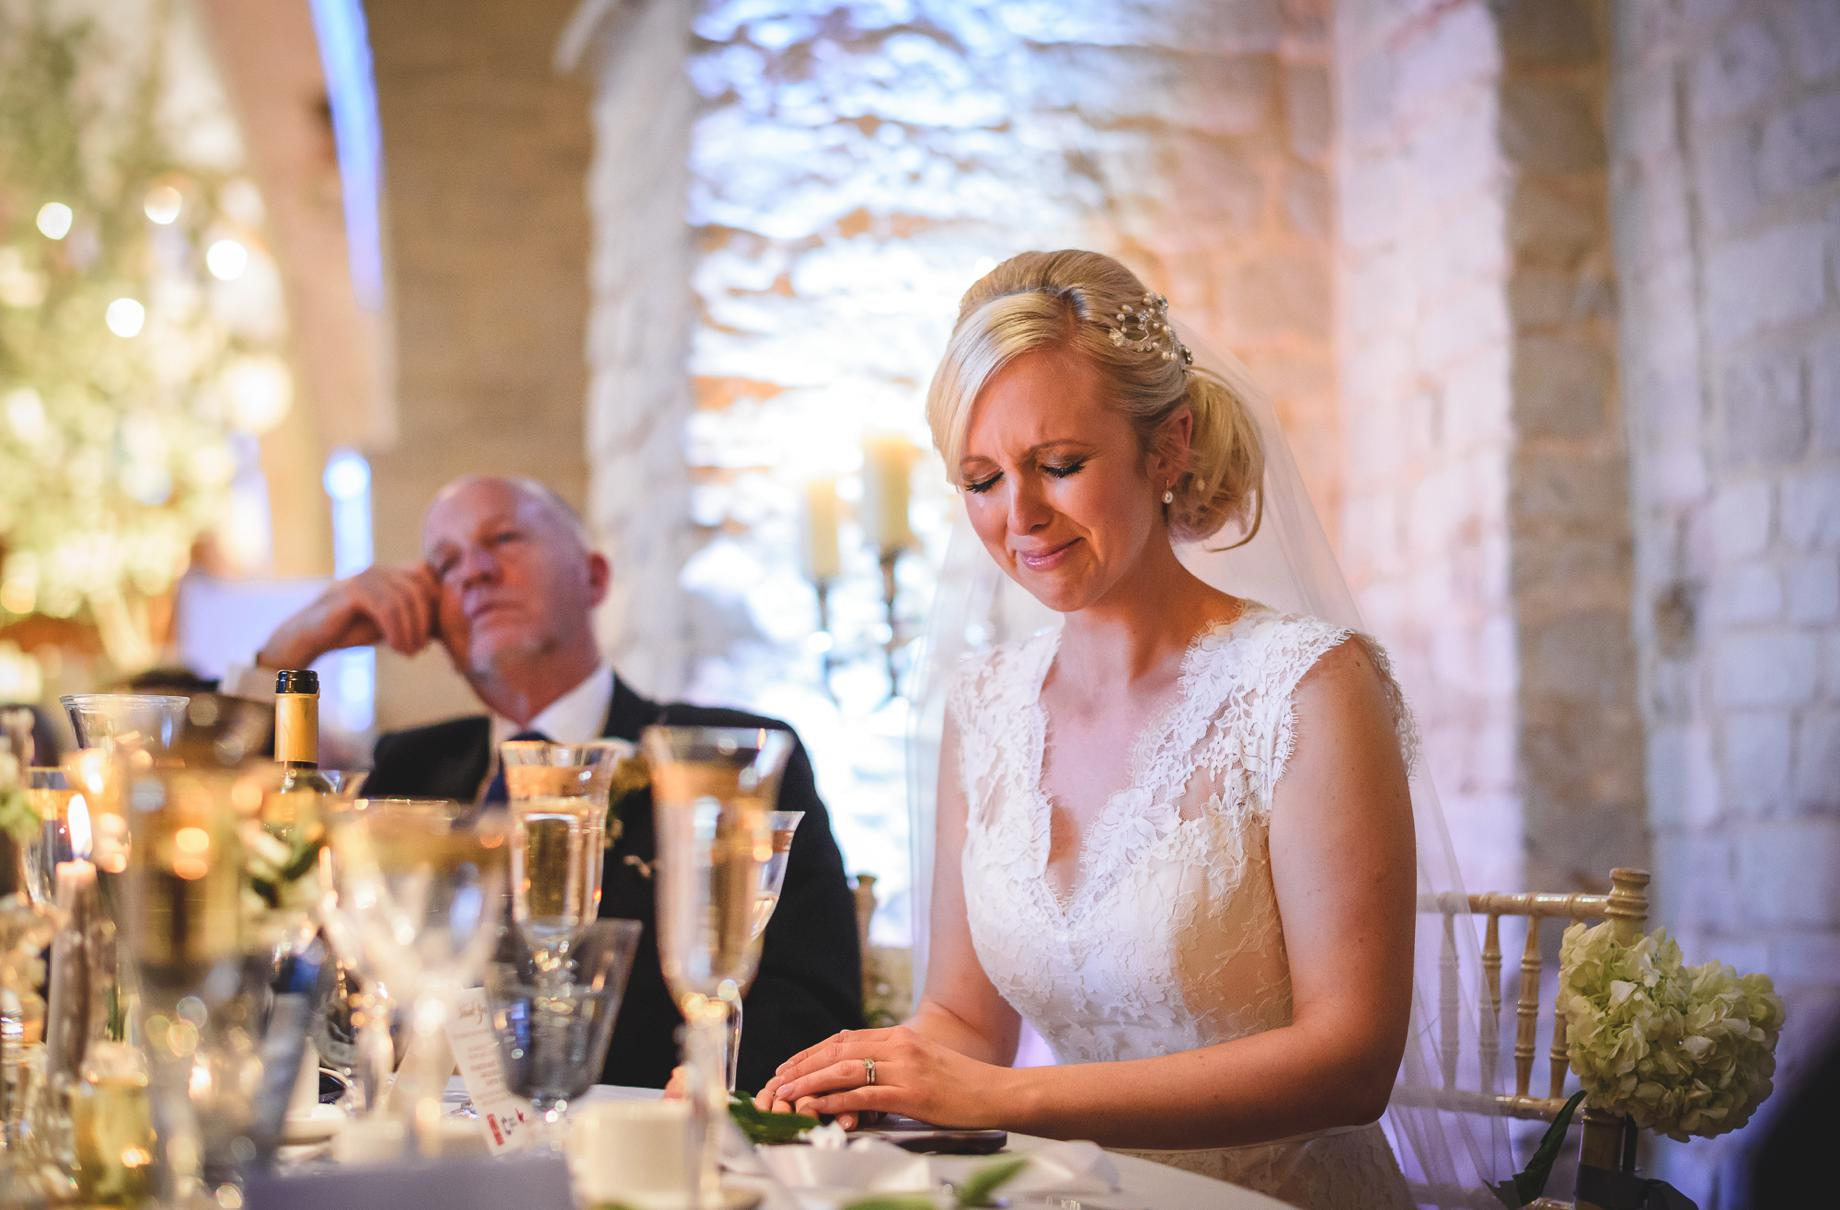 Rozie-and-Tom-Wedding-Slides-184-of-232